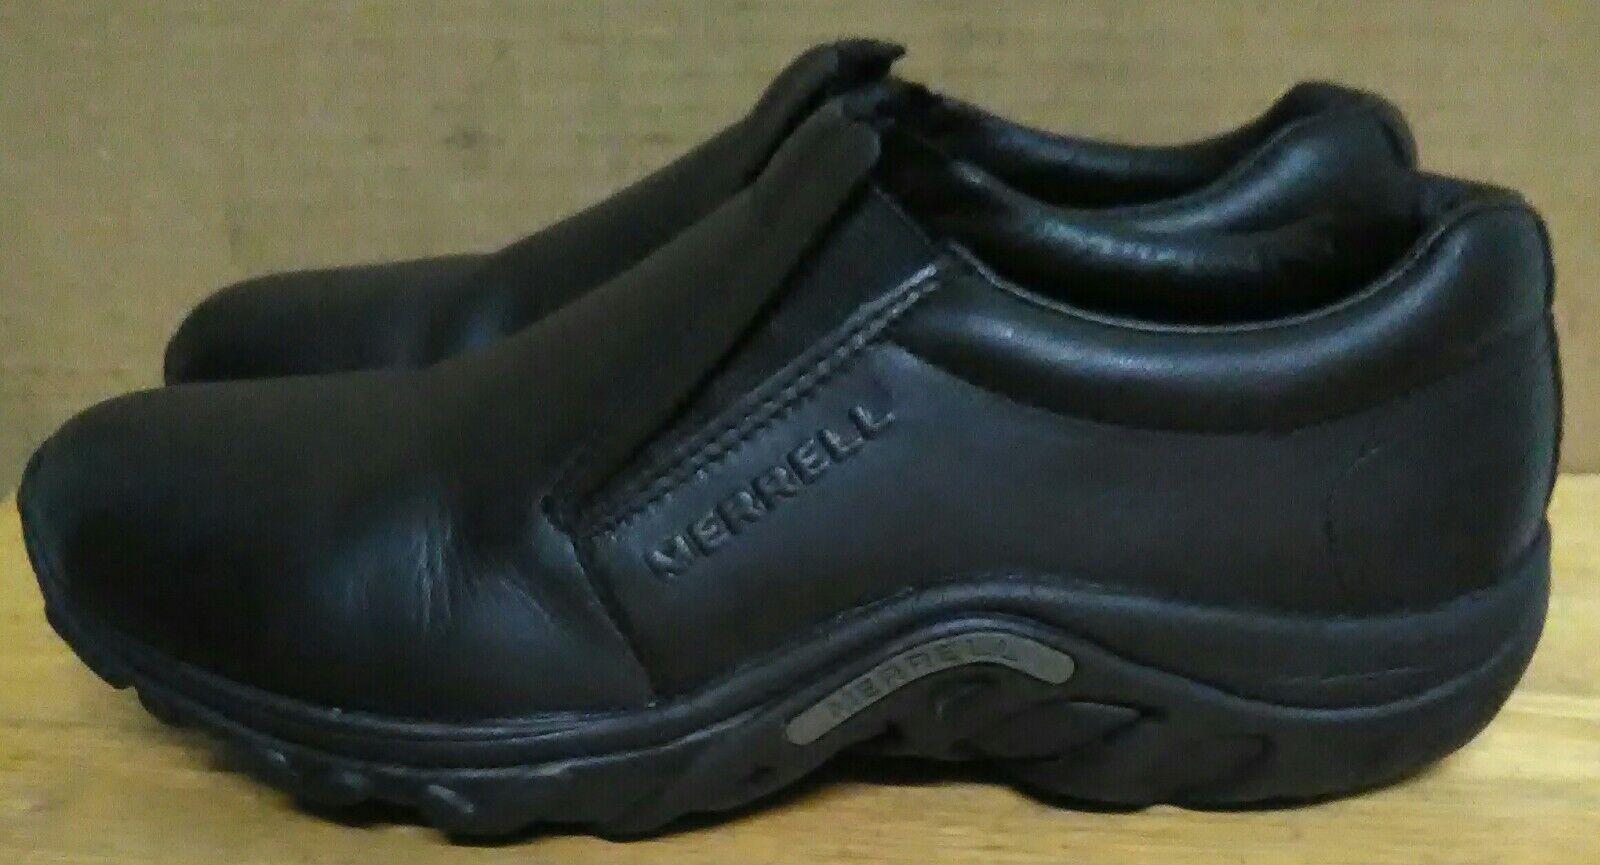 34976639176a Men s Merrell Merrell Merrell Jungle Moc Slip On shoes Midnight Black  Leather. Sz 11 06e18d